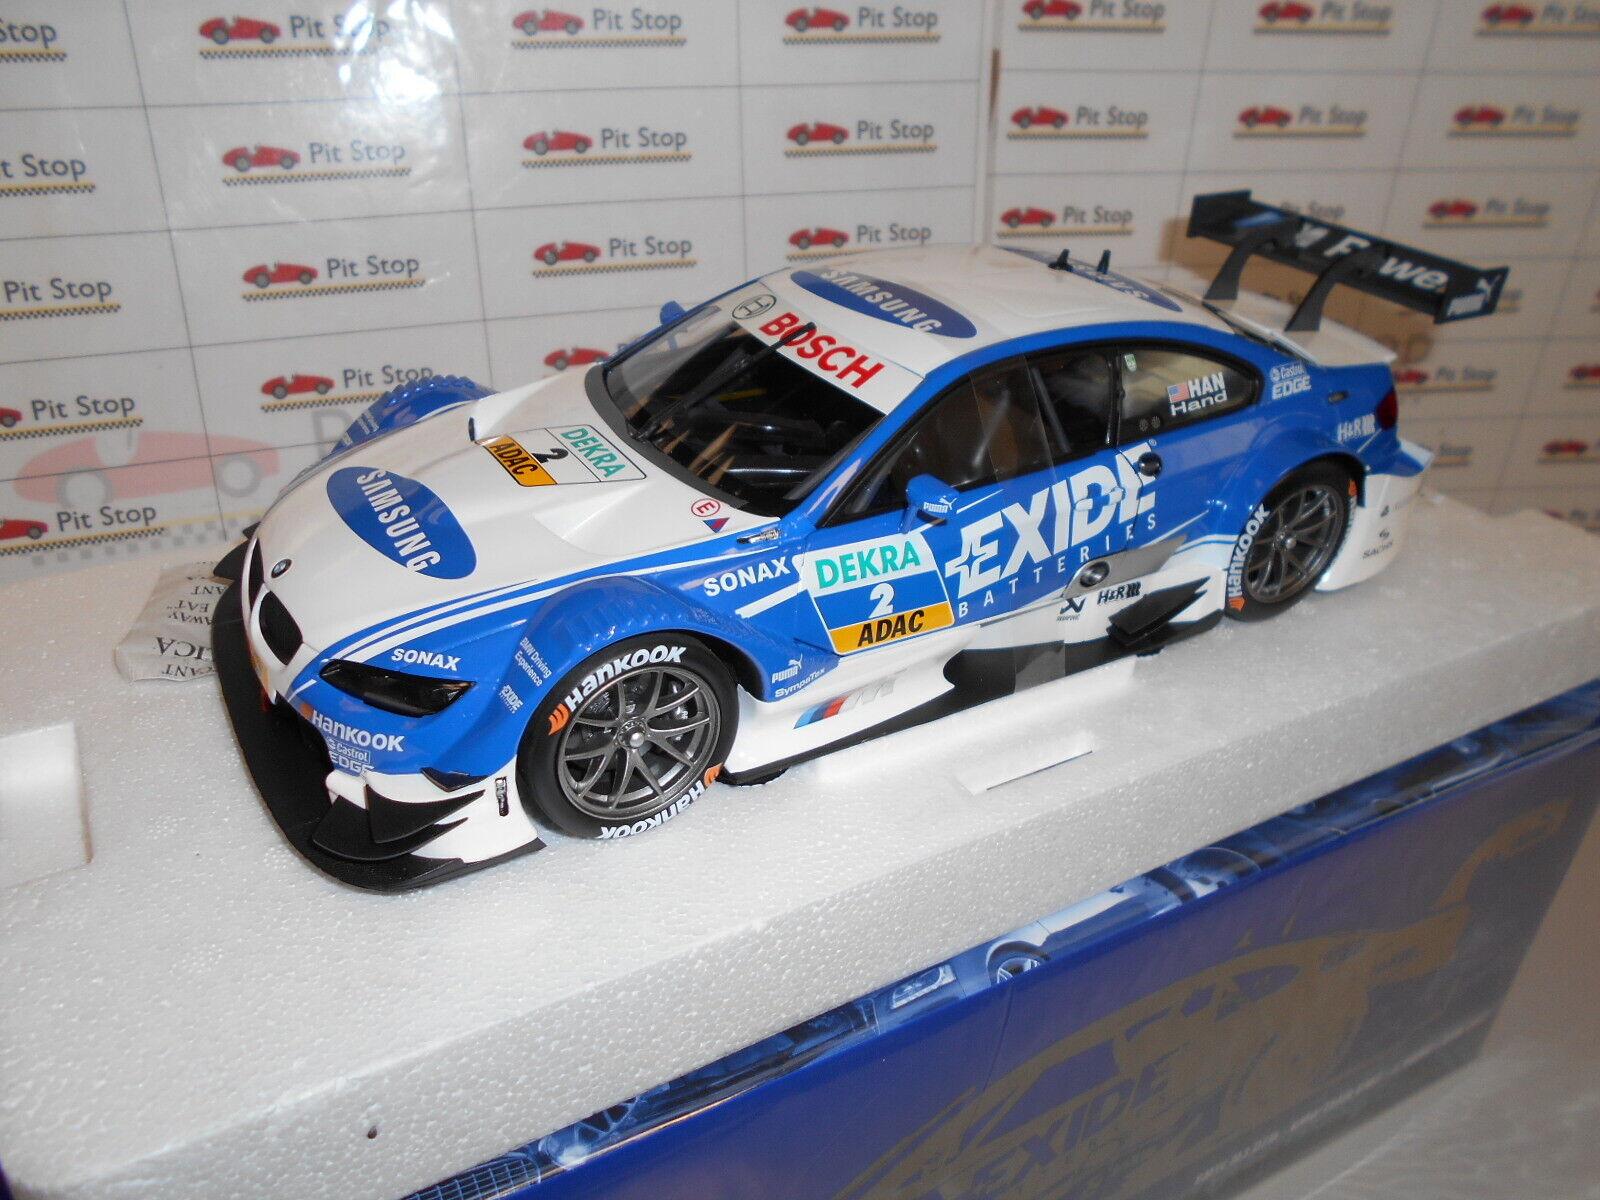 MIN100122202 by MINICHAMPS BMW M3 DTM -BMW TEAM RMG- J.HAND DTM 2012 1 18